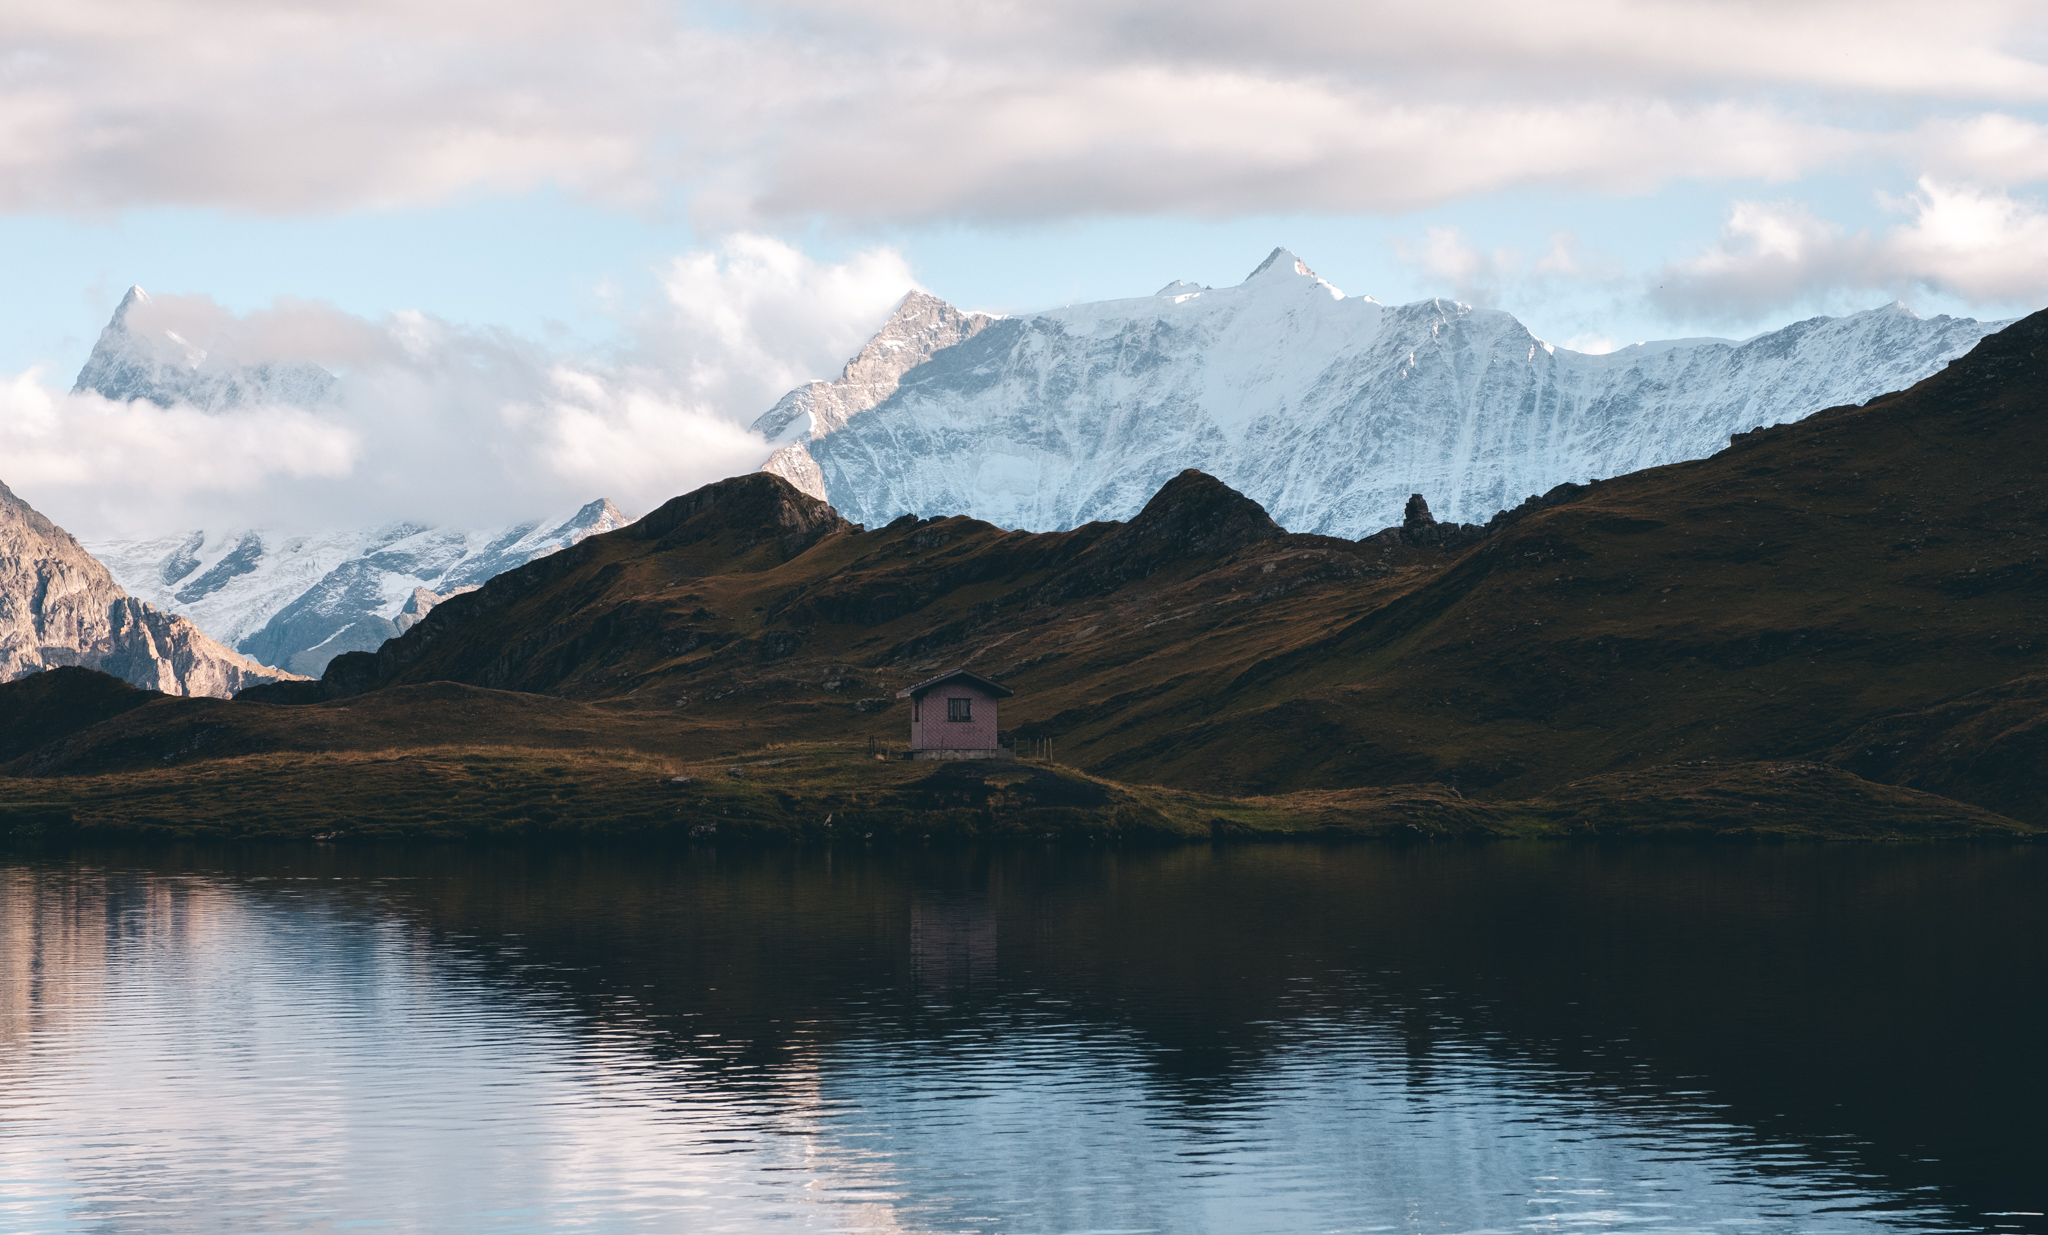 Hütte beim Bachalpsee | © Boardshortslife